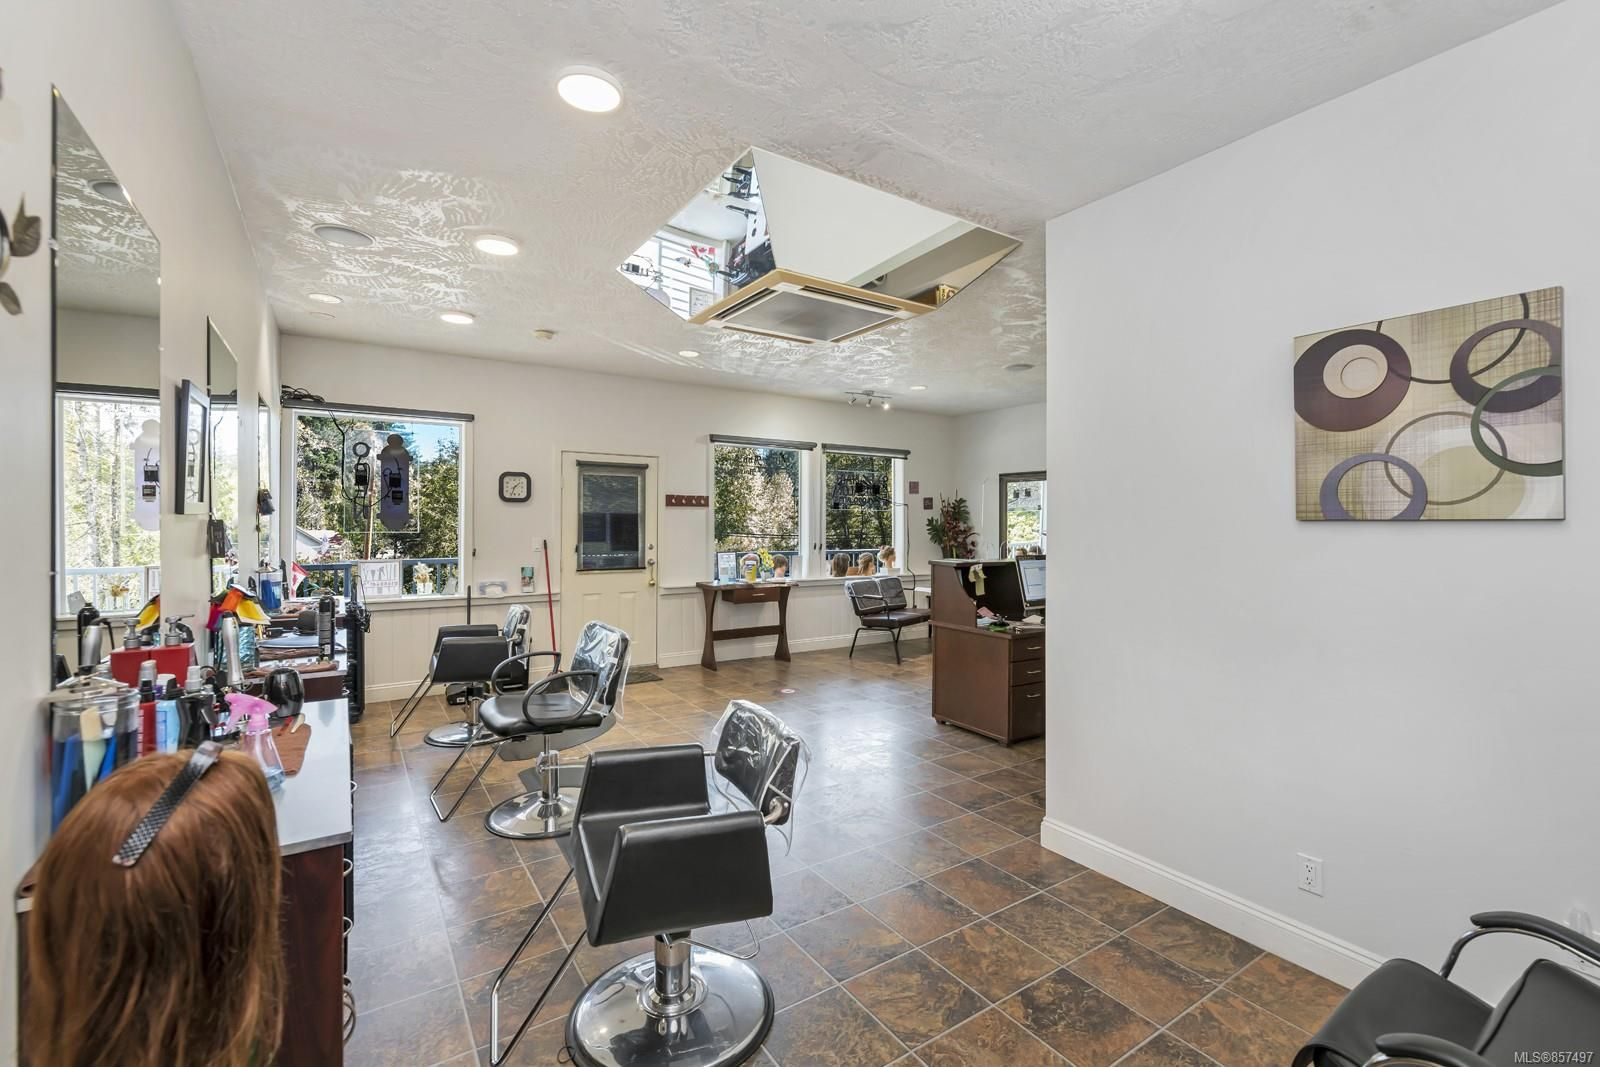 Main Photo: 4 1855 Renfrew Rd in : ML Shawnigan Business for sale (Malahat & Area)  : MLS®# 857497